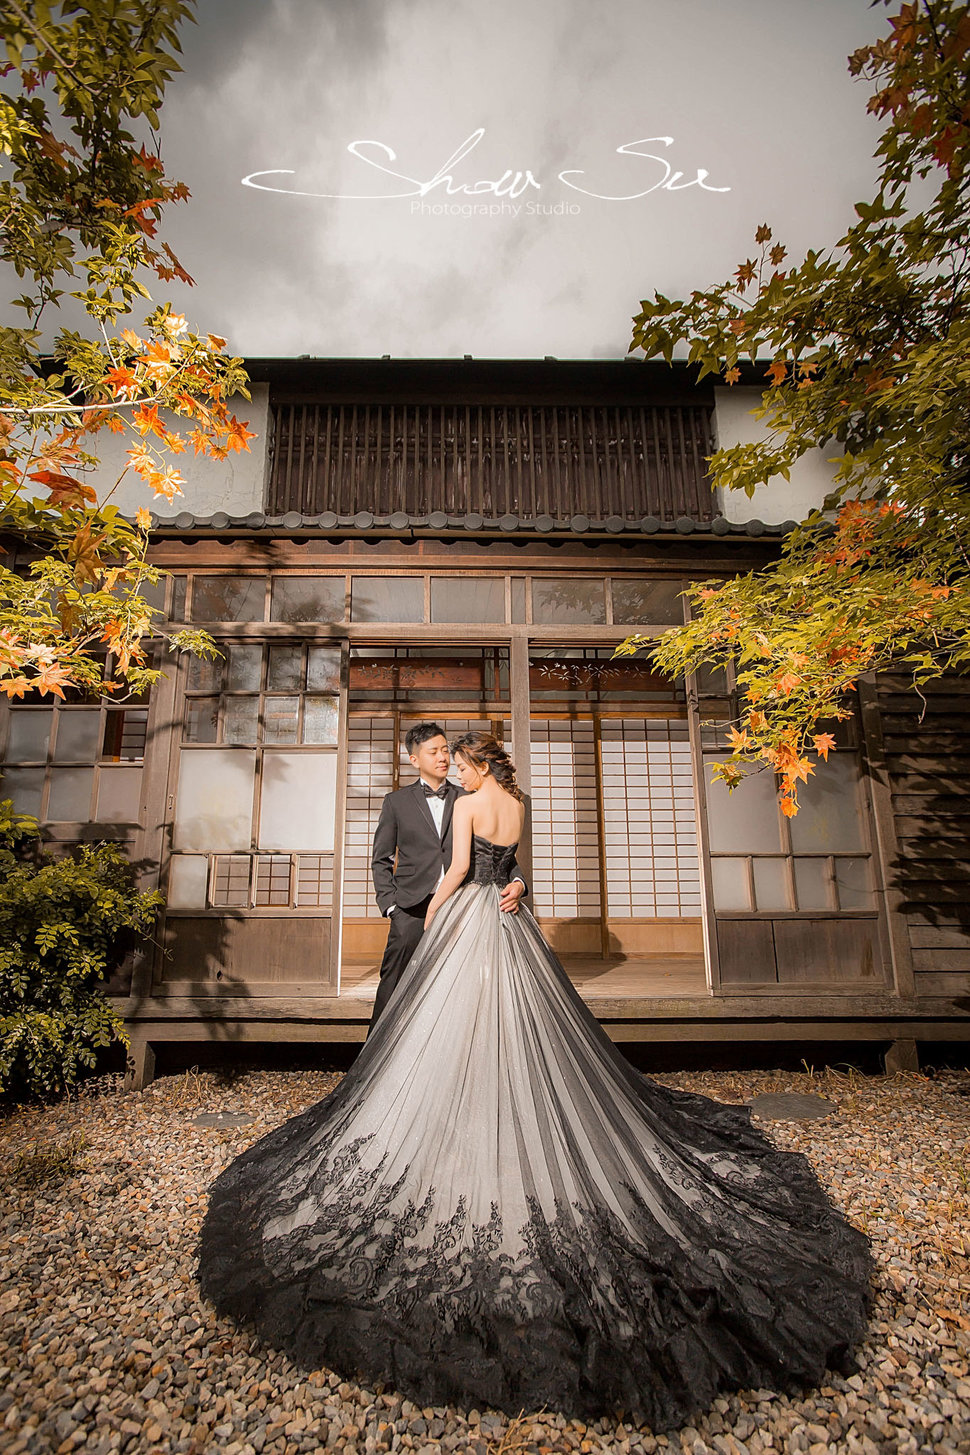 IMG_5266 - Show Su Photography《結婚吧》